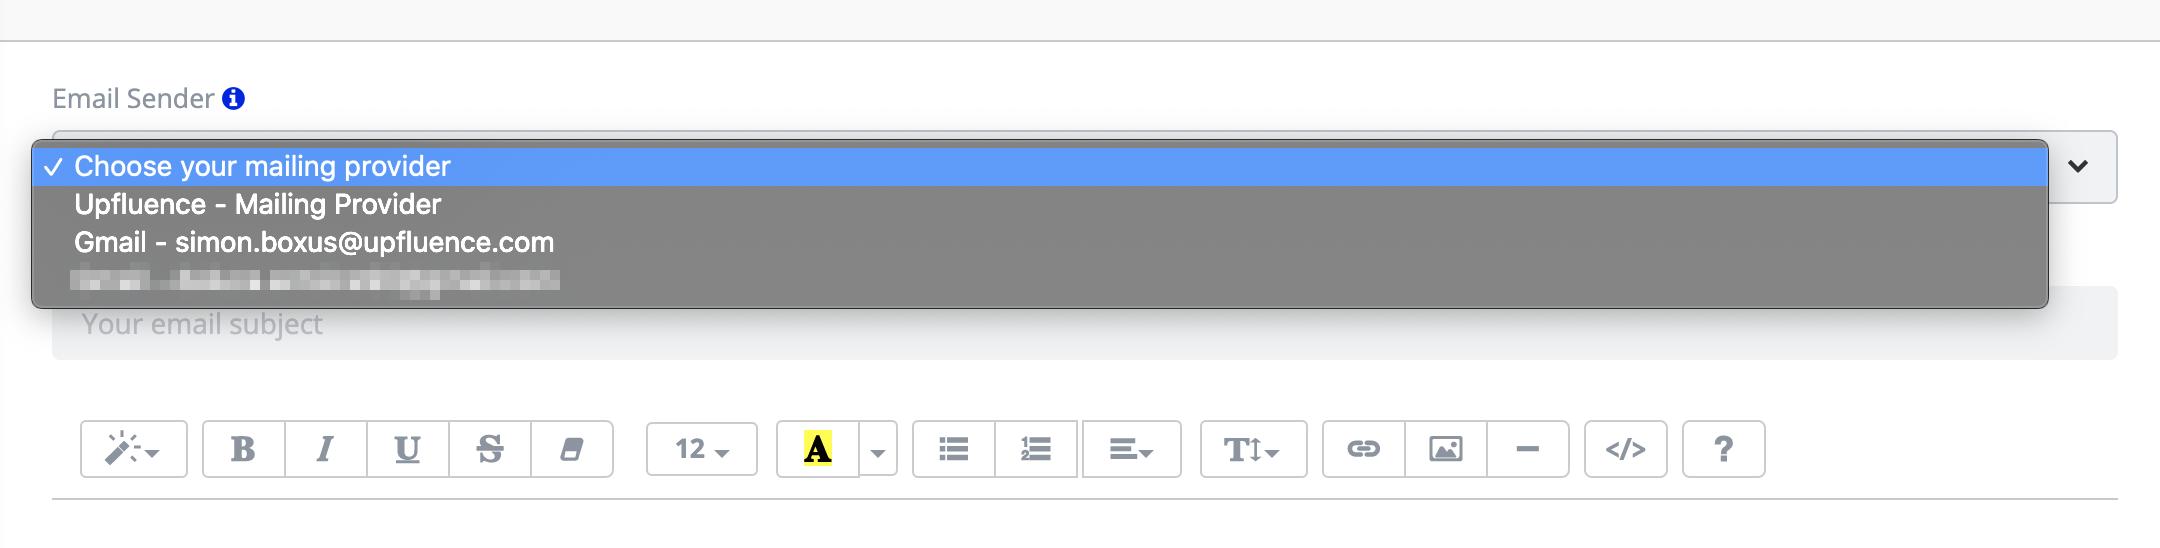 Email Sender Selection